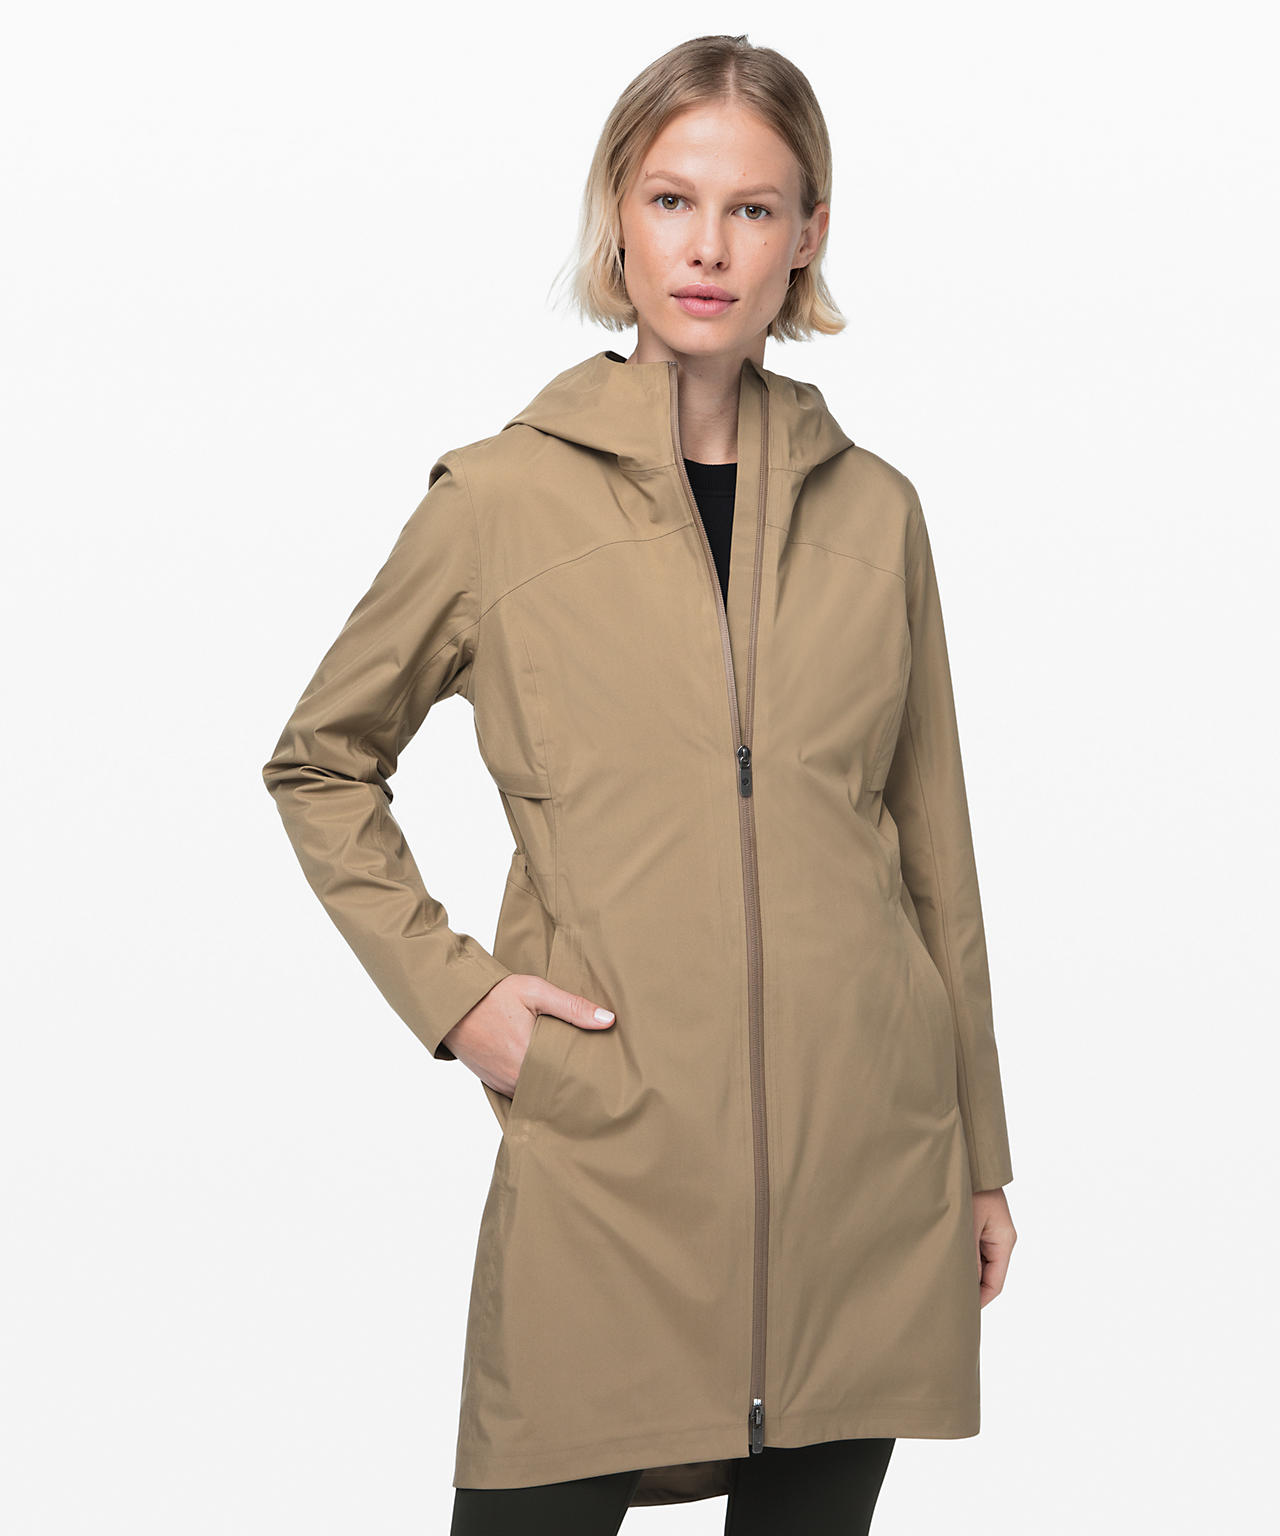 Rain Rebel Jacket, Frontier, Lululemon Upload, Lululemon Rain Jacket